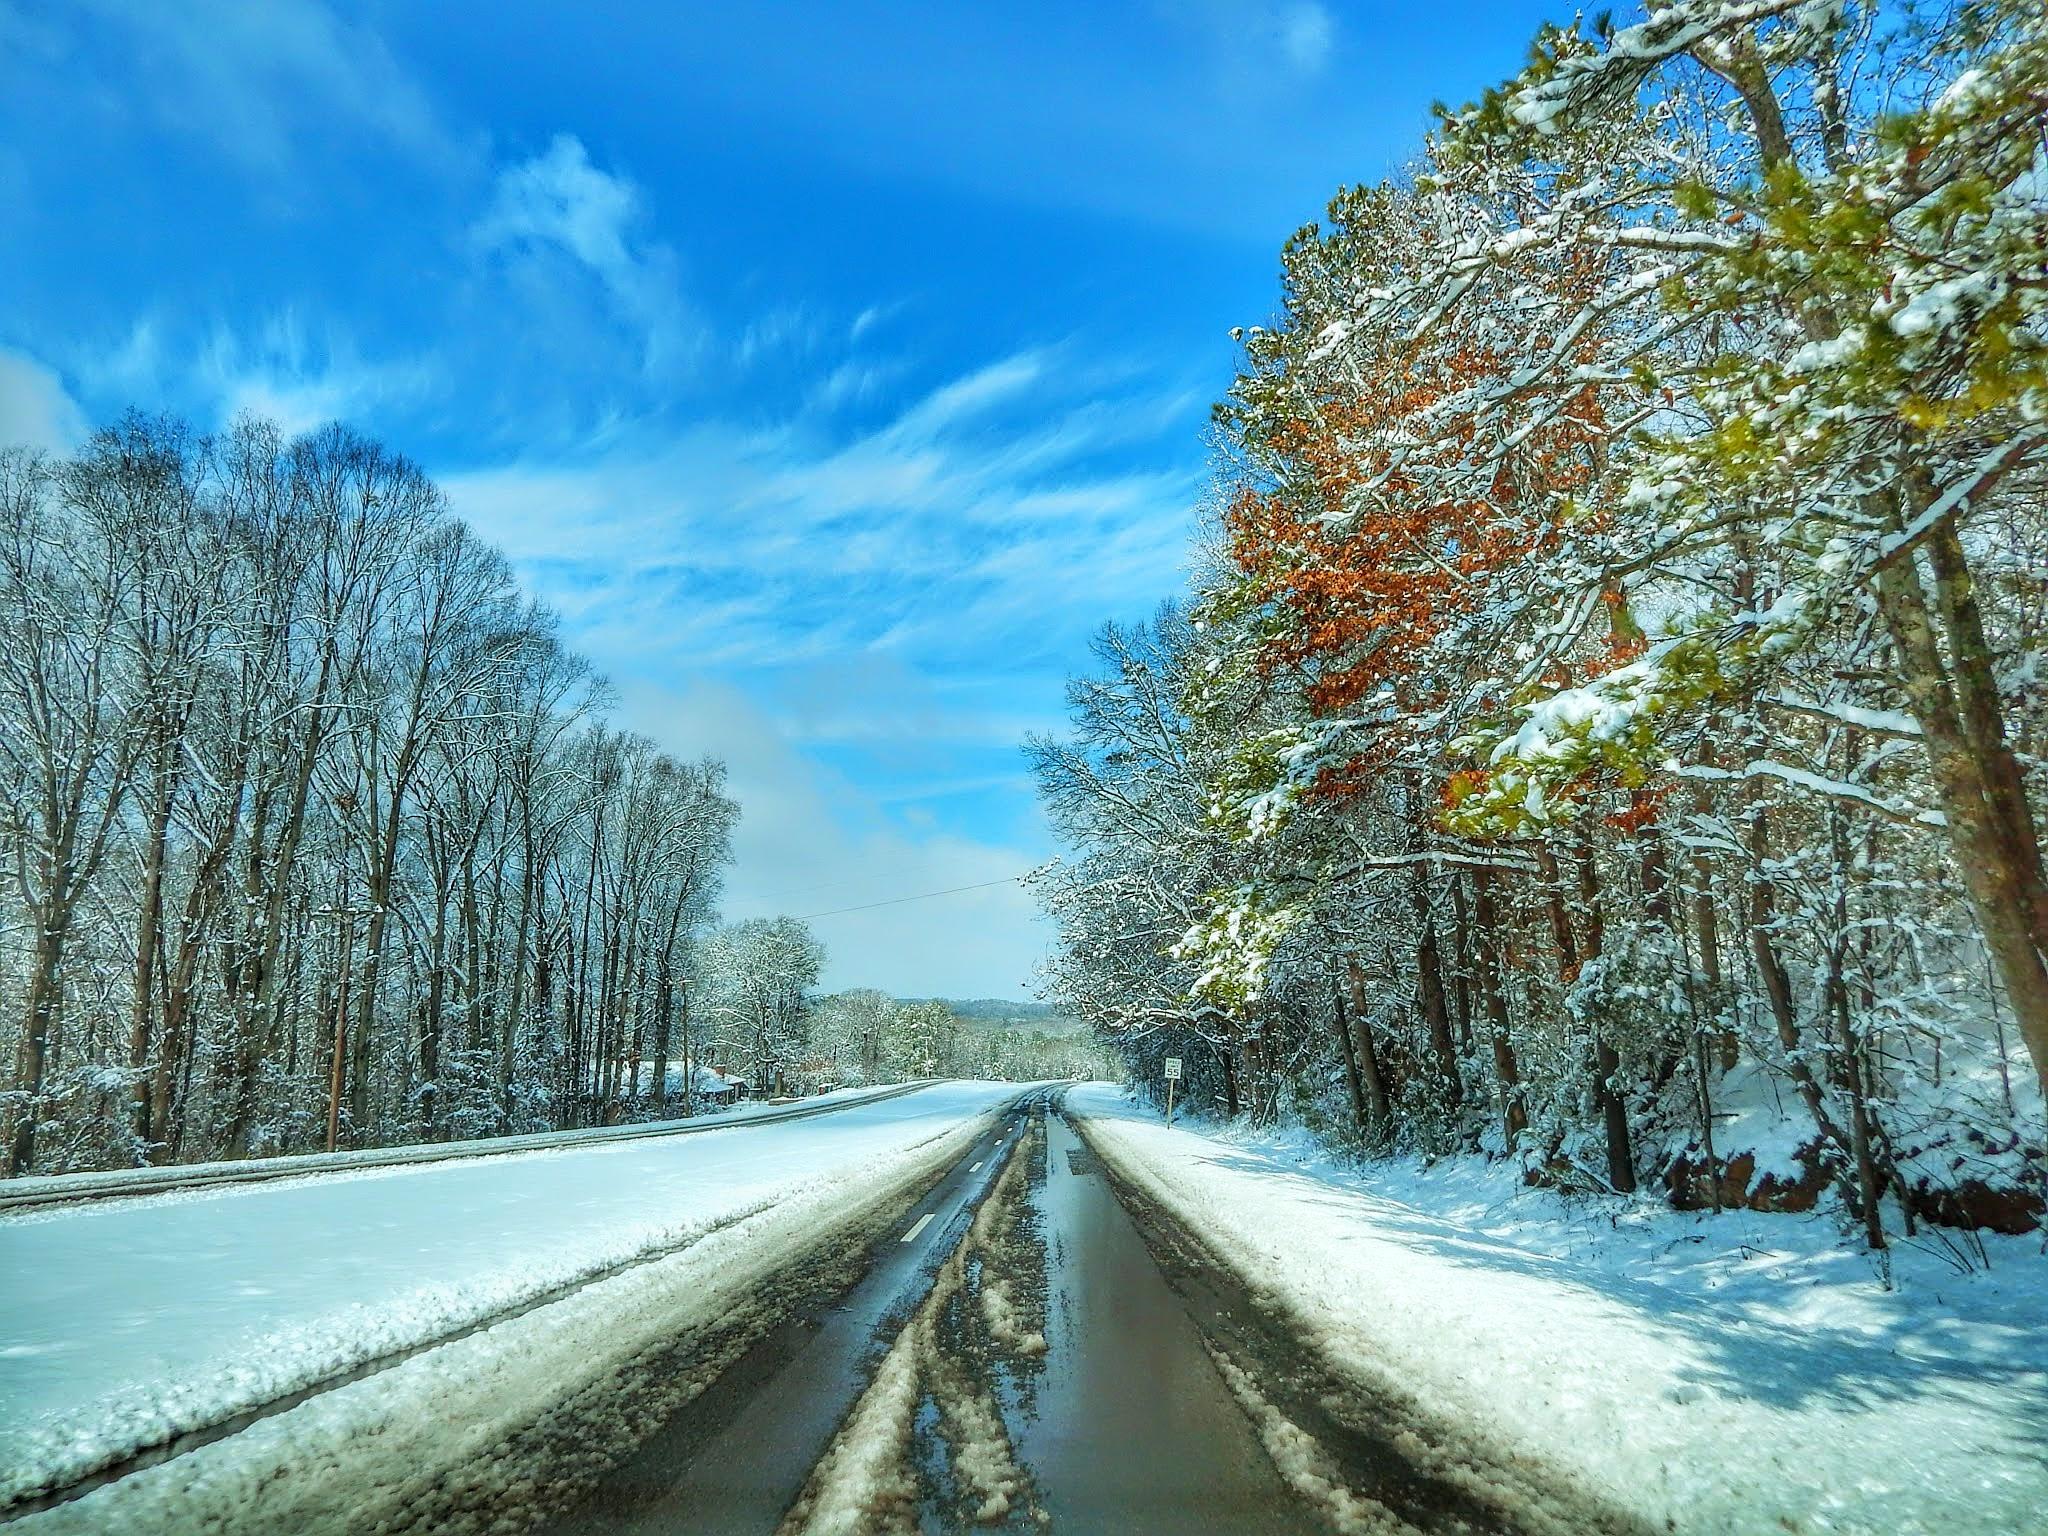 Frozen Highway by Cindy Eddy